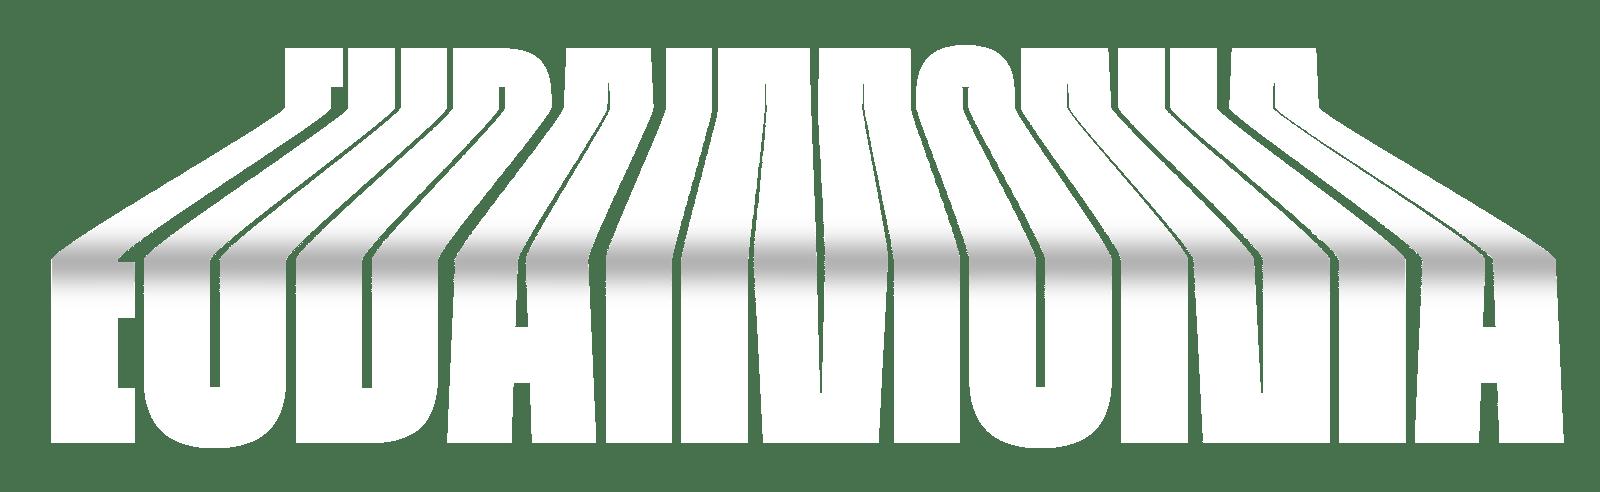 Type Treatment Vol 1 Wavy